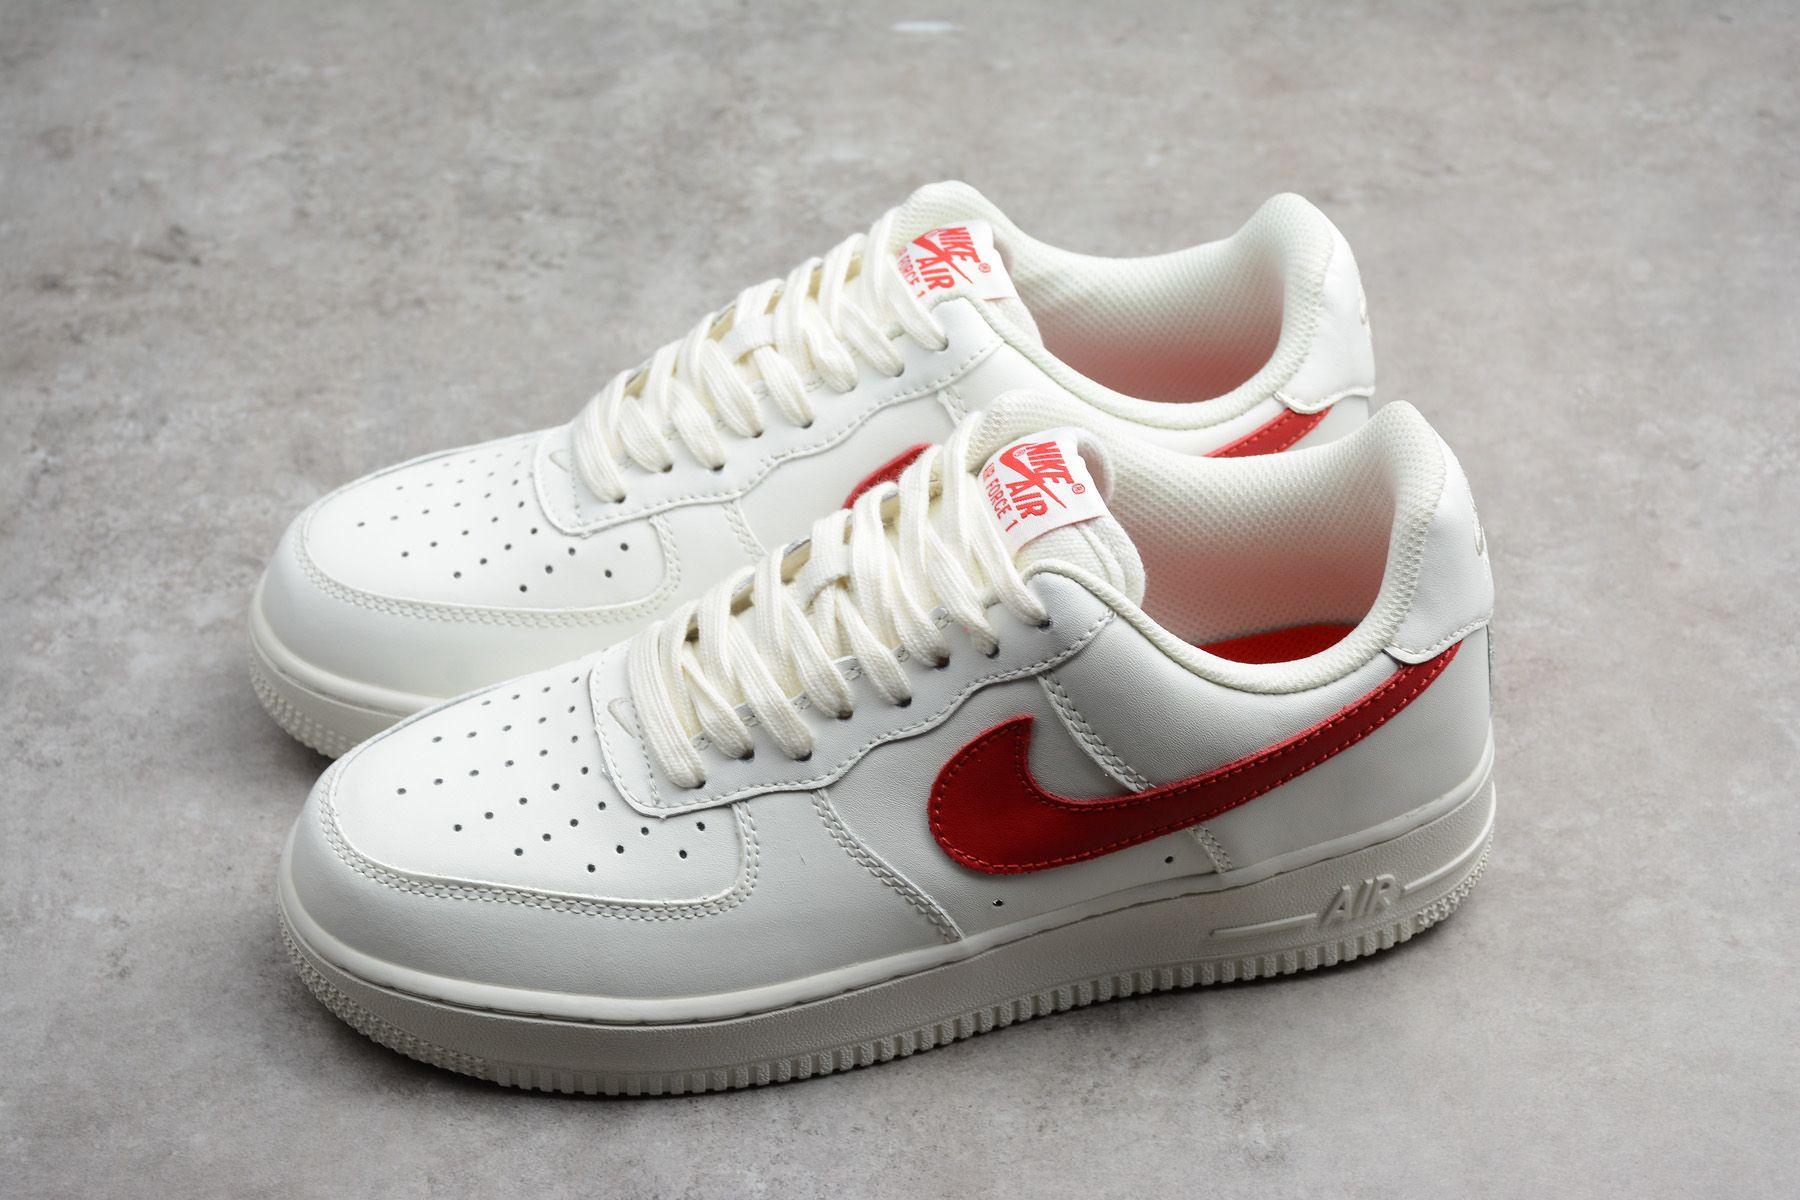 Nike Air Force 1 Low 07 Sail University Red 315122 126 Nike Air Force Ones Nike Air Nike Air Force